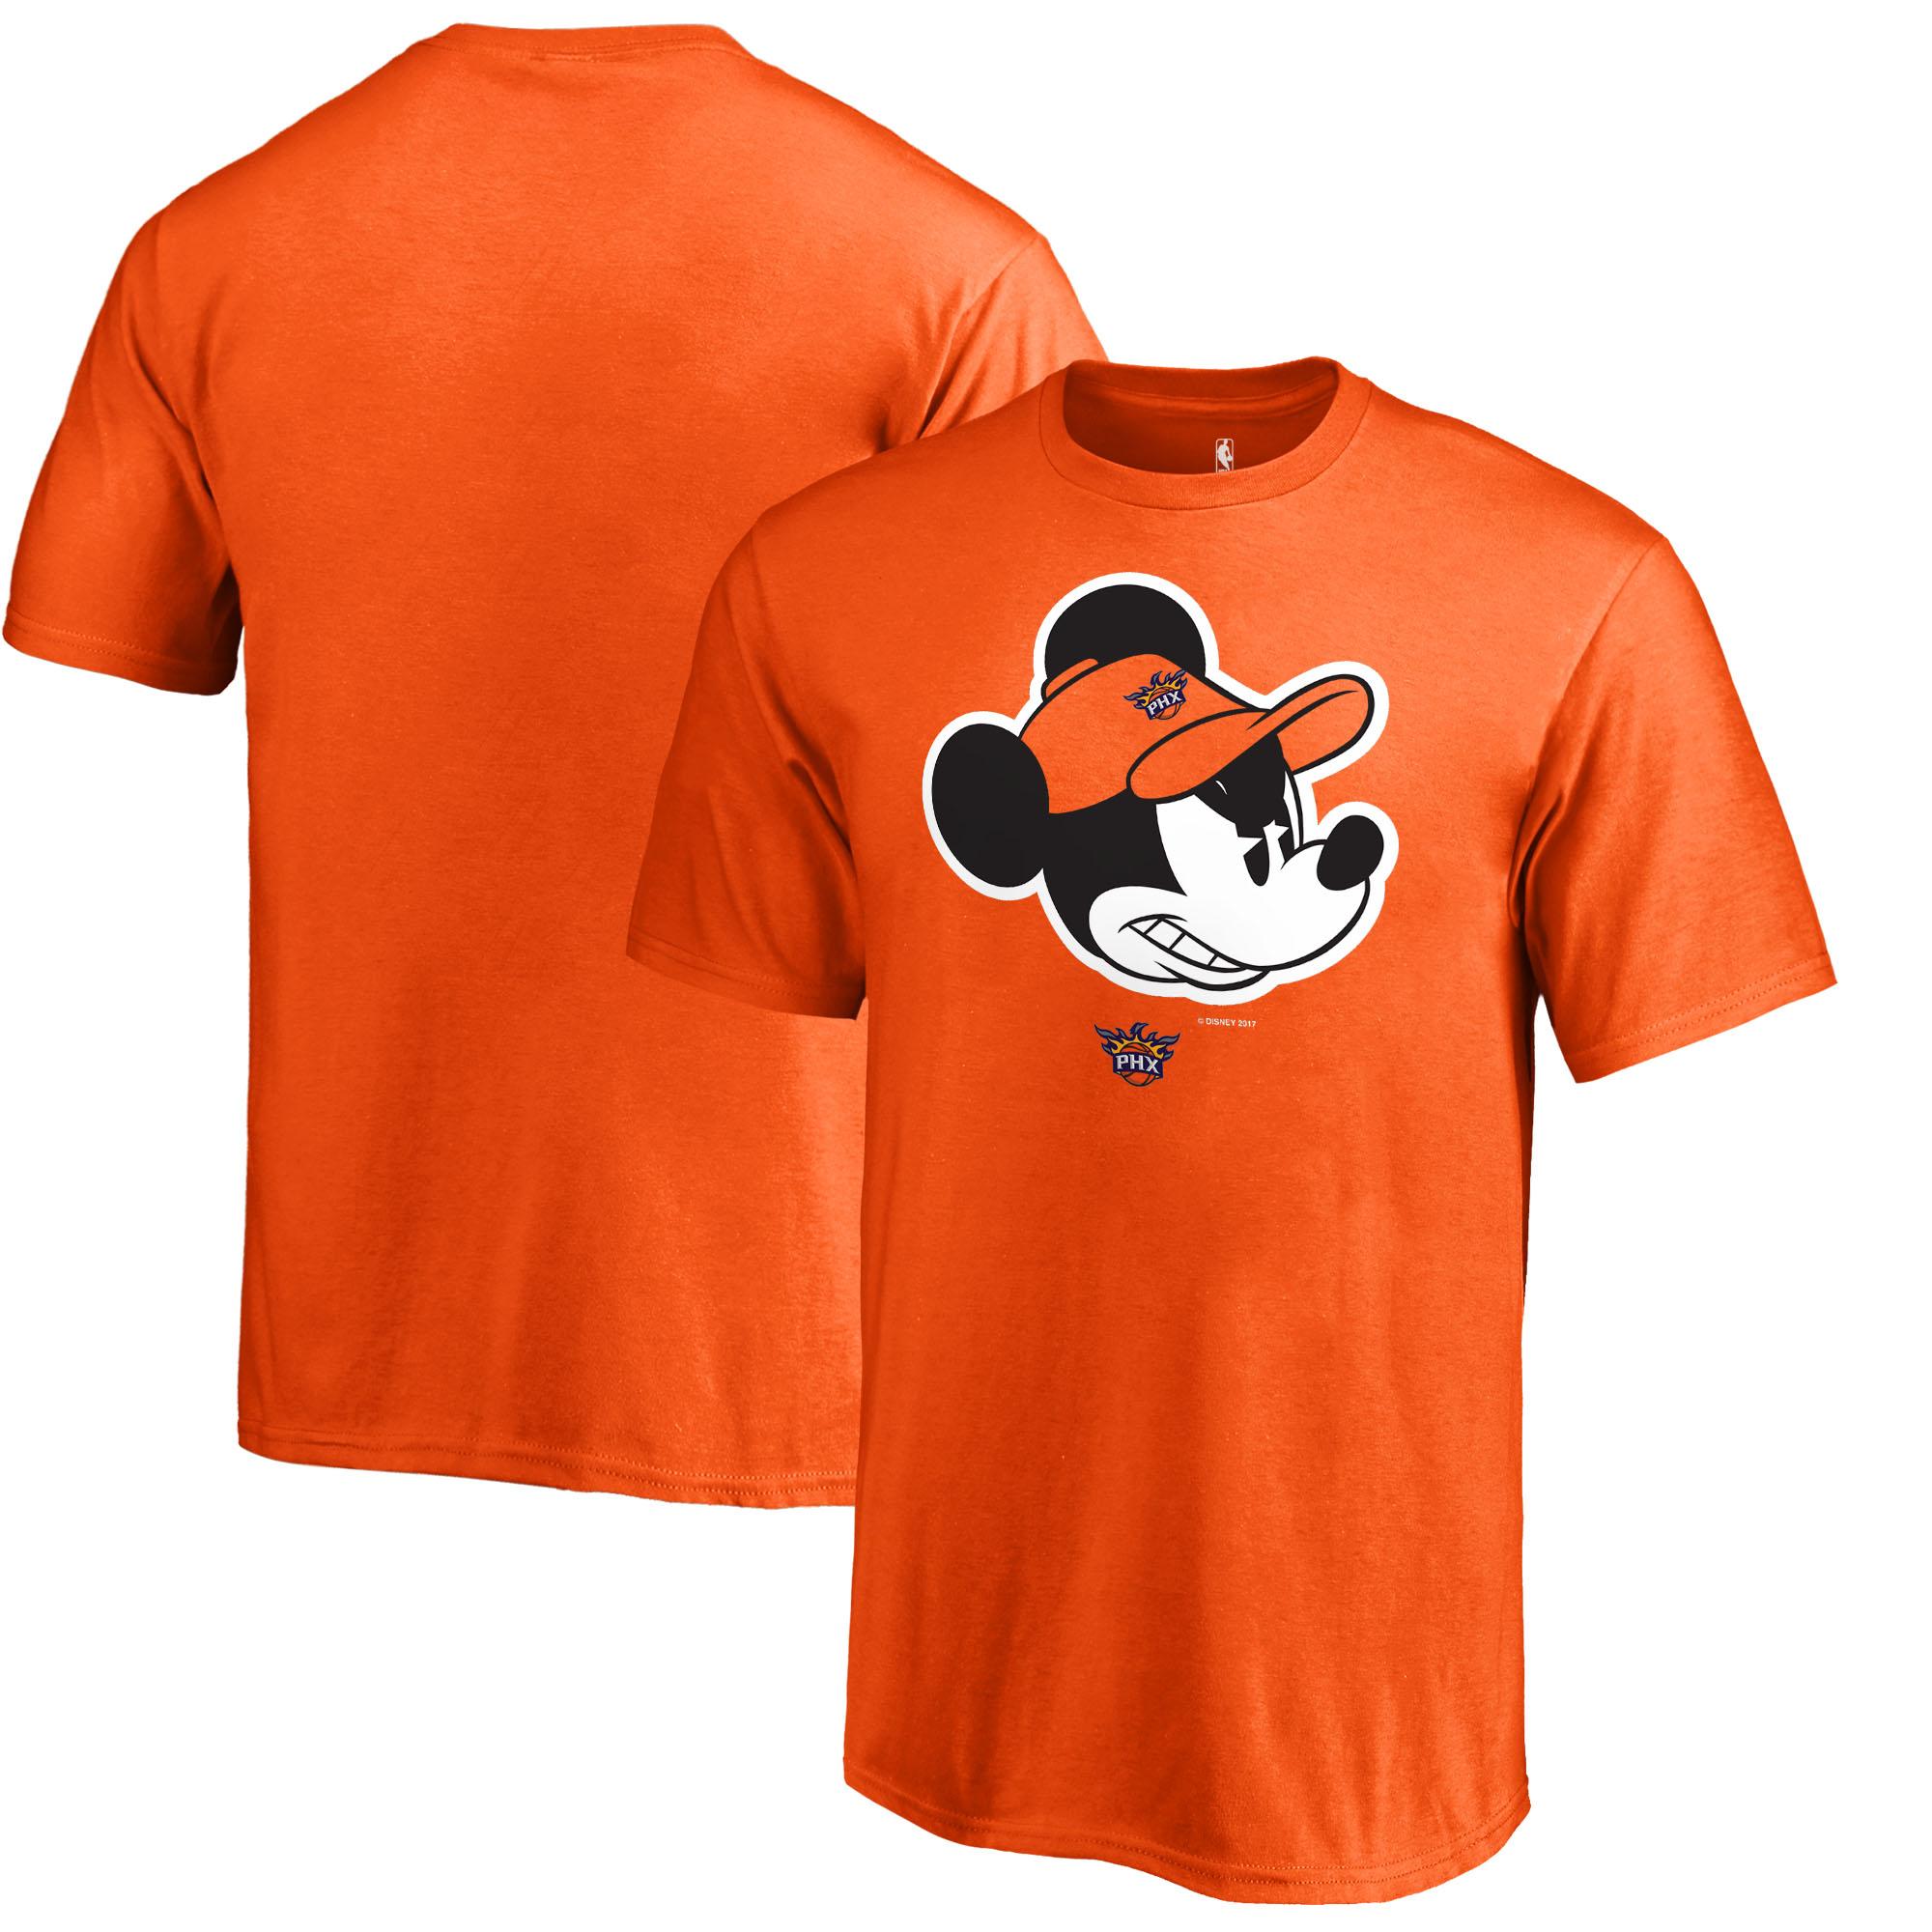 Phoenix Suns Fanatics Branded Youth Disney Game Face T-Shirt - Orange